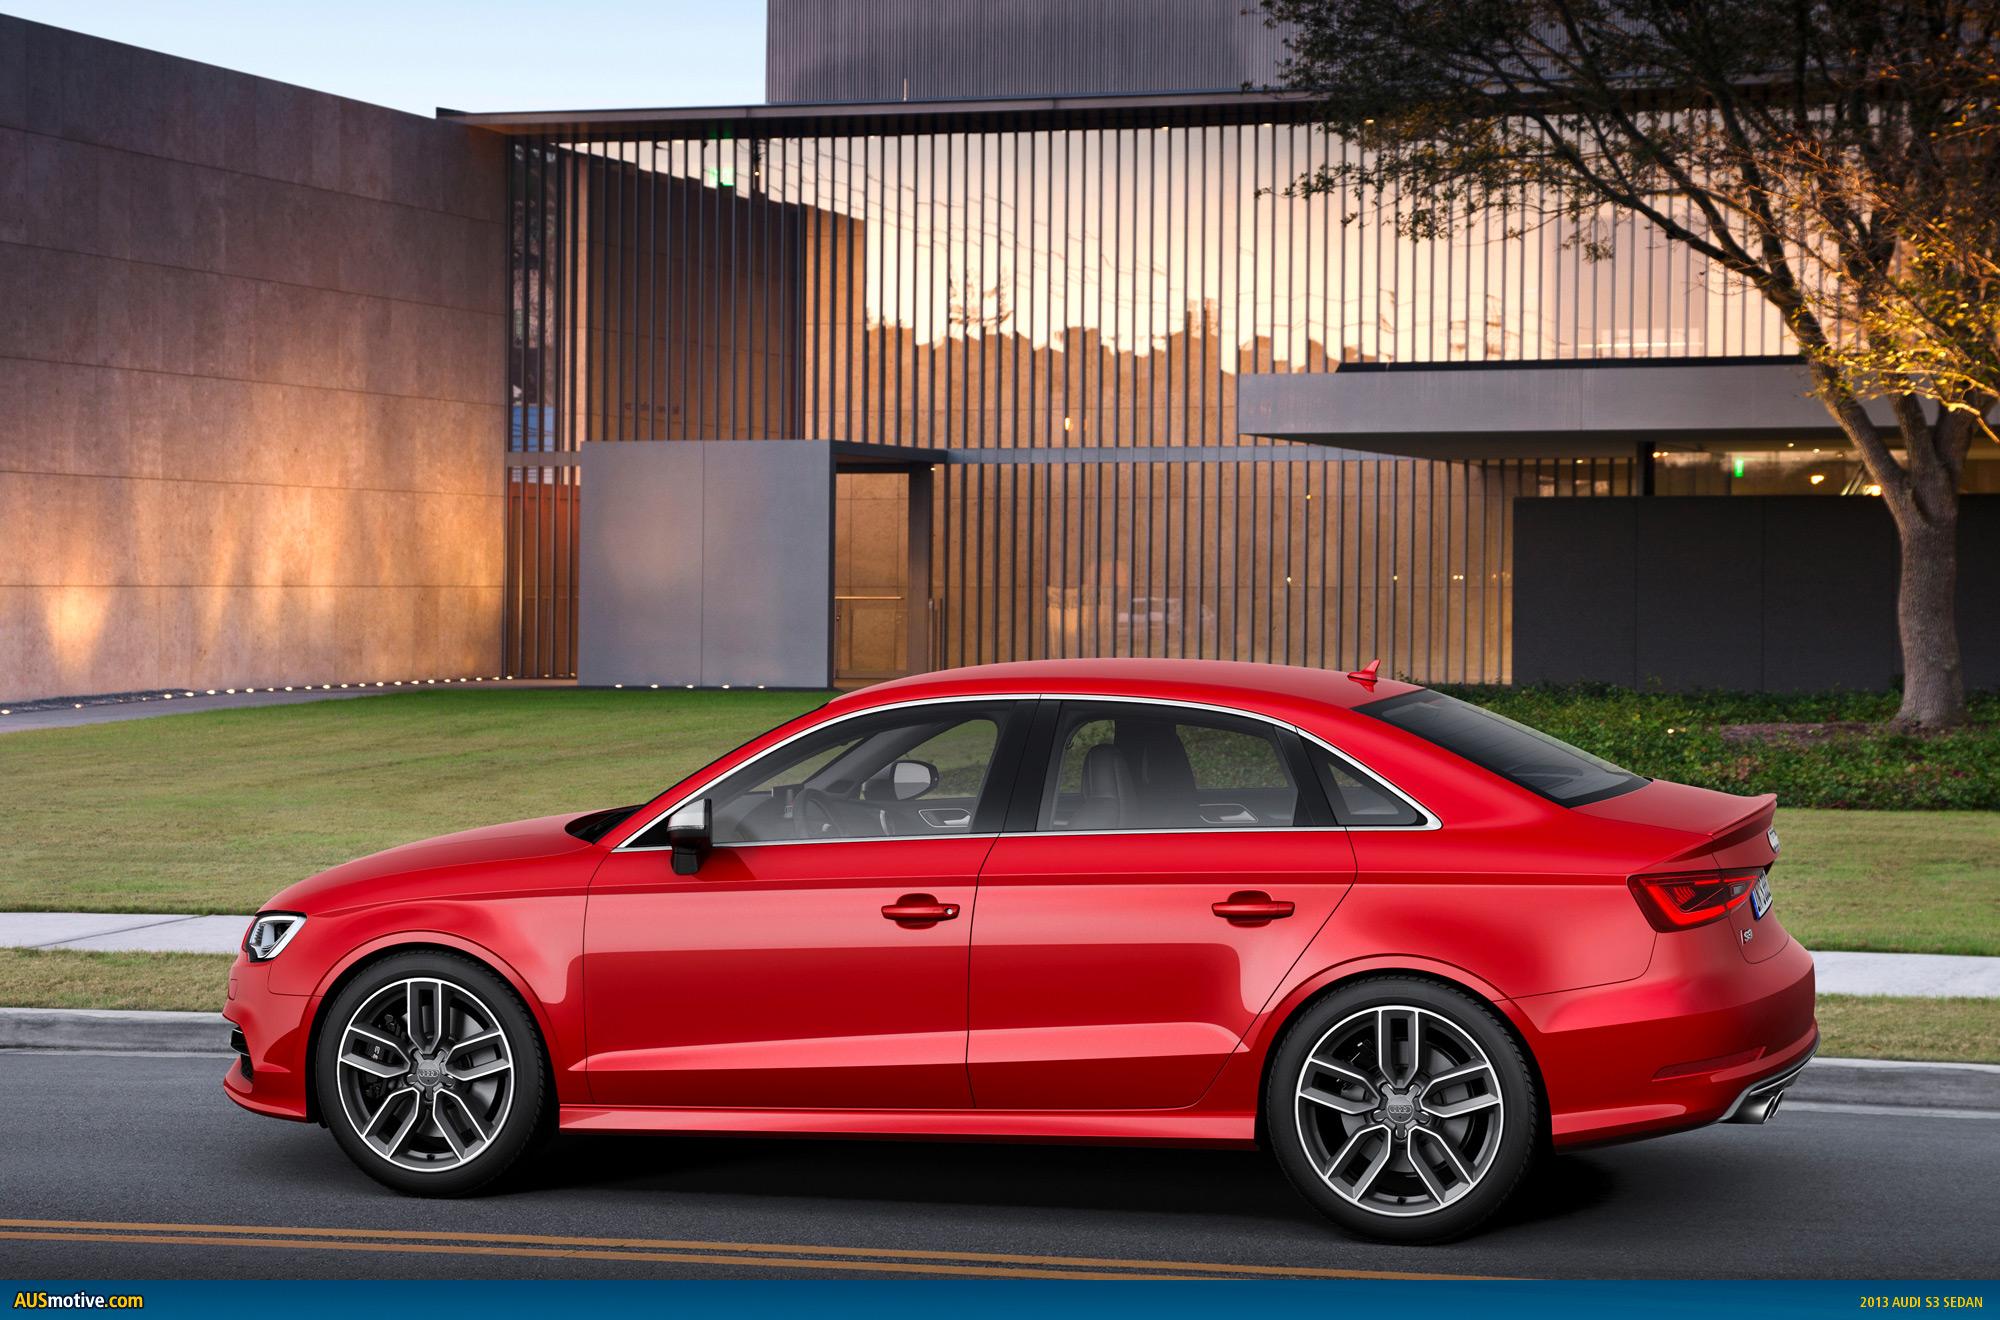 AUSmotive.com » New York 2013: Audi A3/S3 sedan